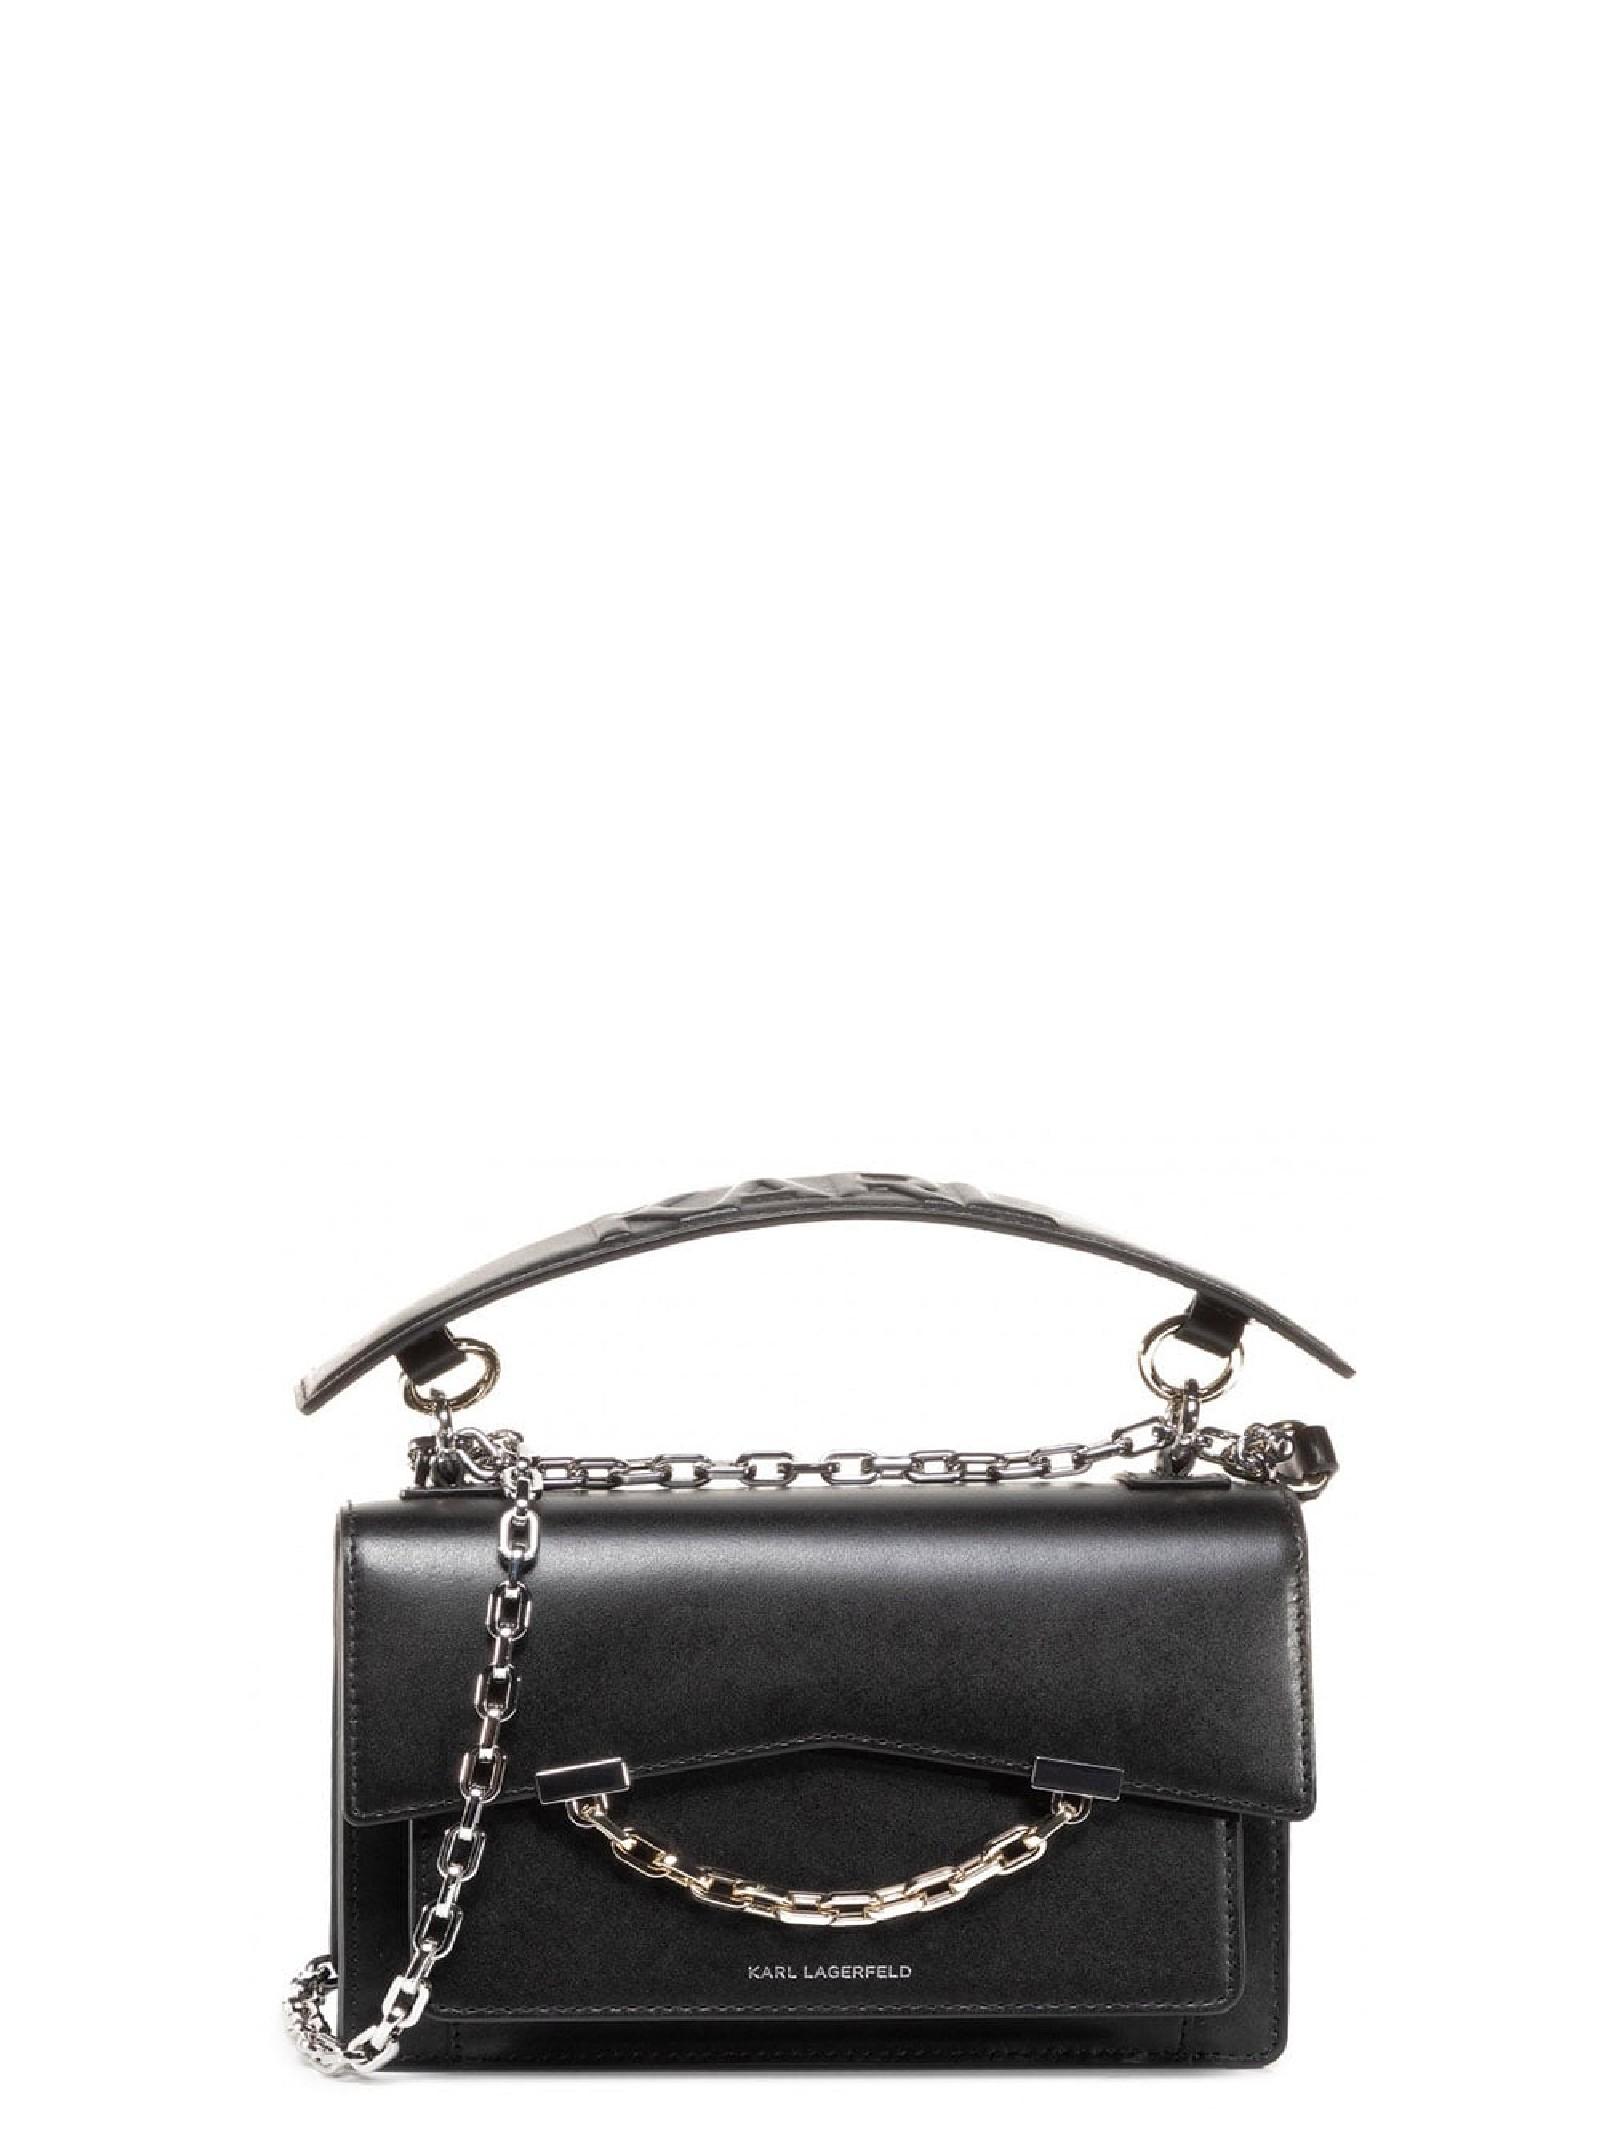 Leather handbag KARL LAGERFELD   Bag   205W3067.21999/A999